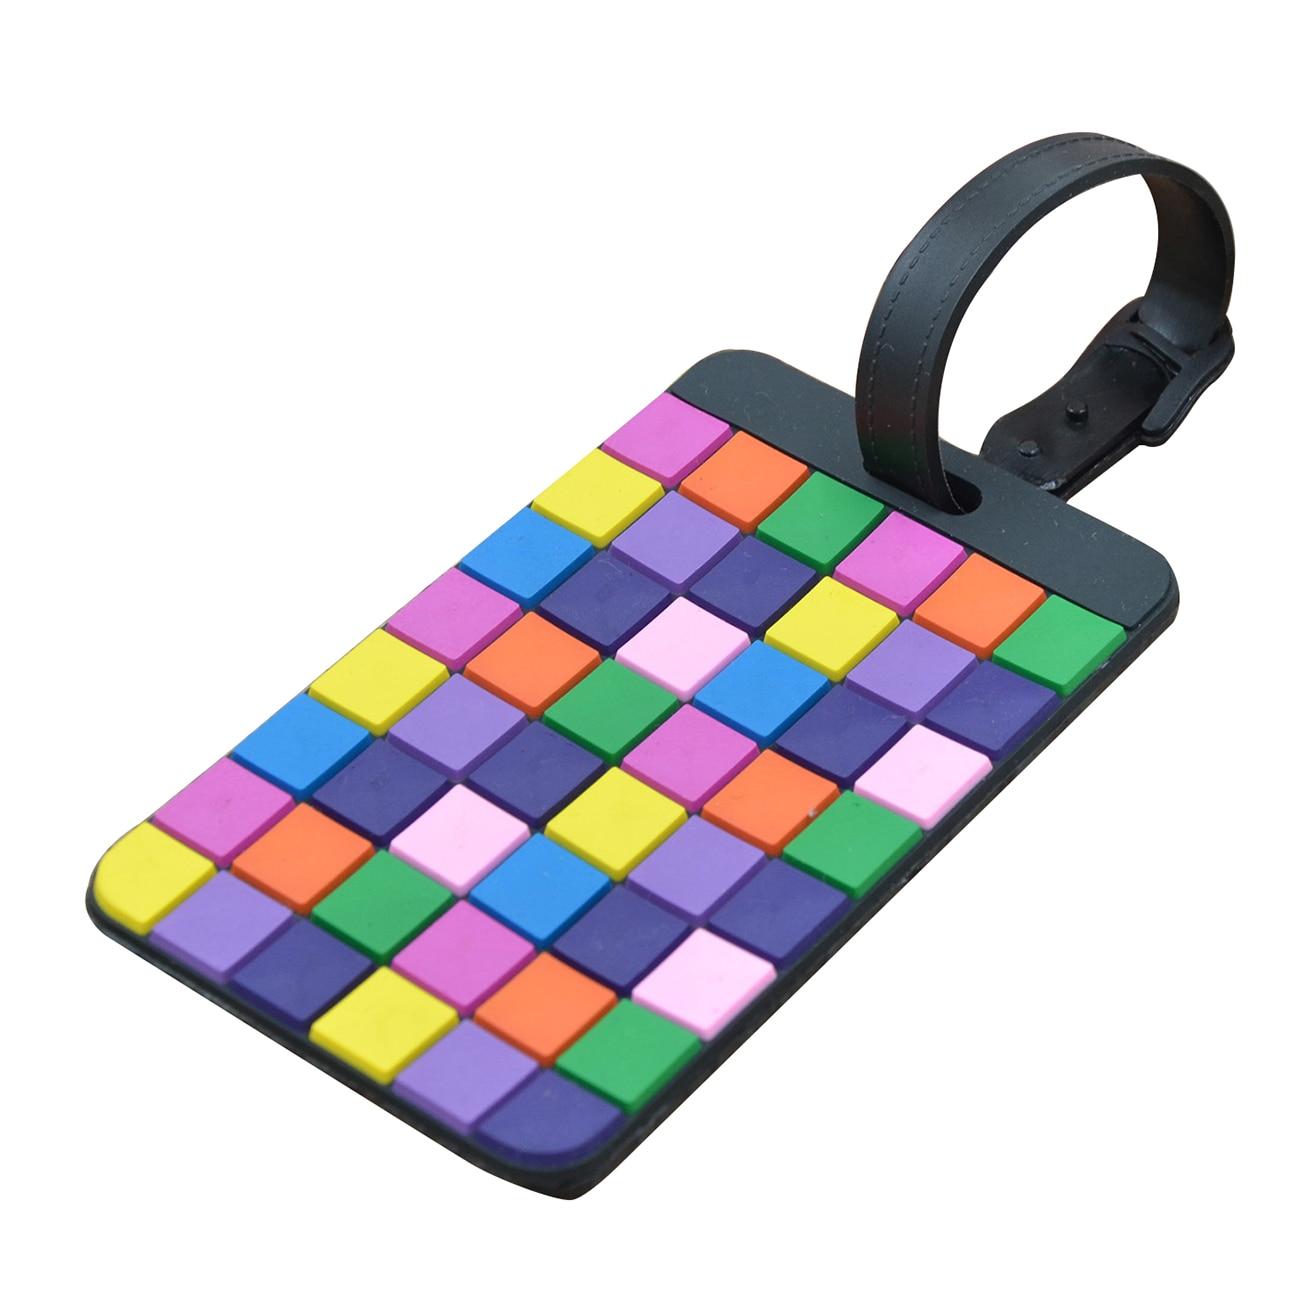 Portable Secure Travel Suitcase ID Luggage Handbag Large Tag Label (Yellow+Purple)